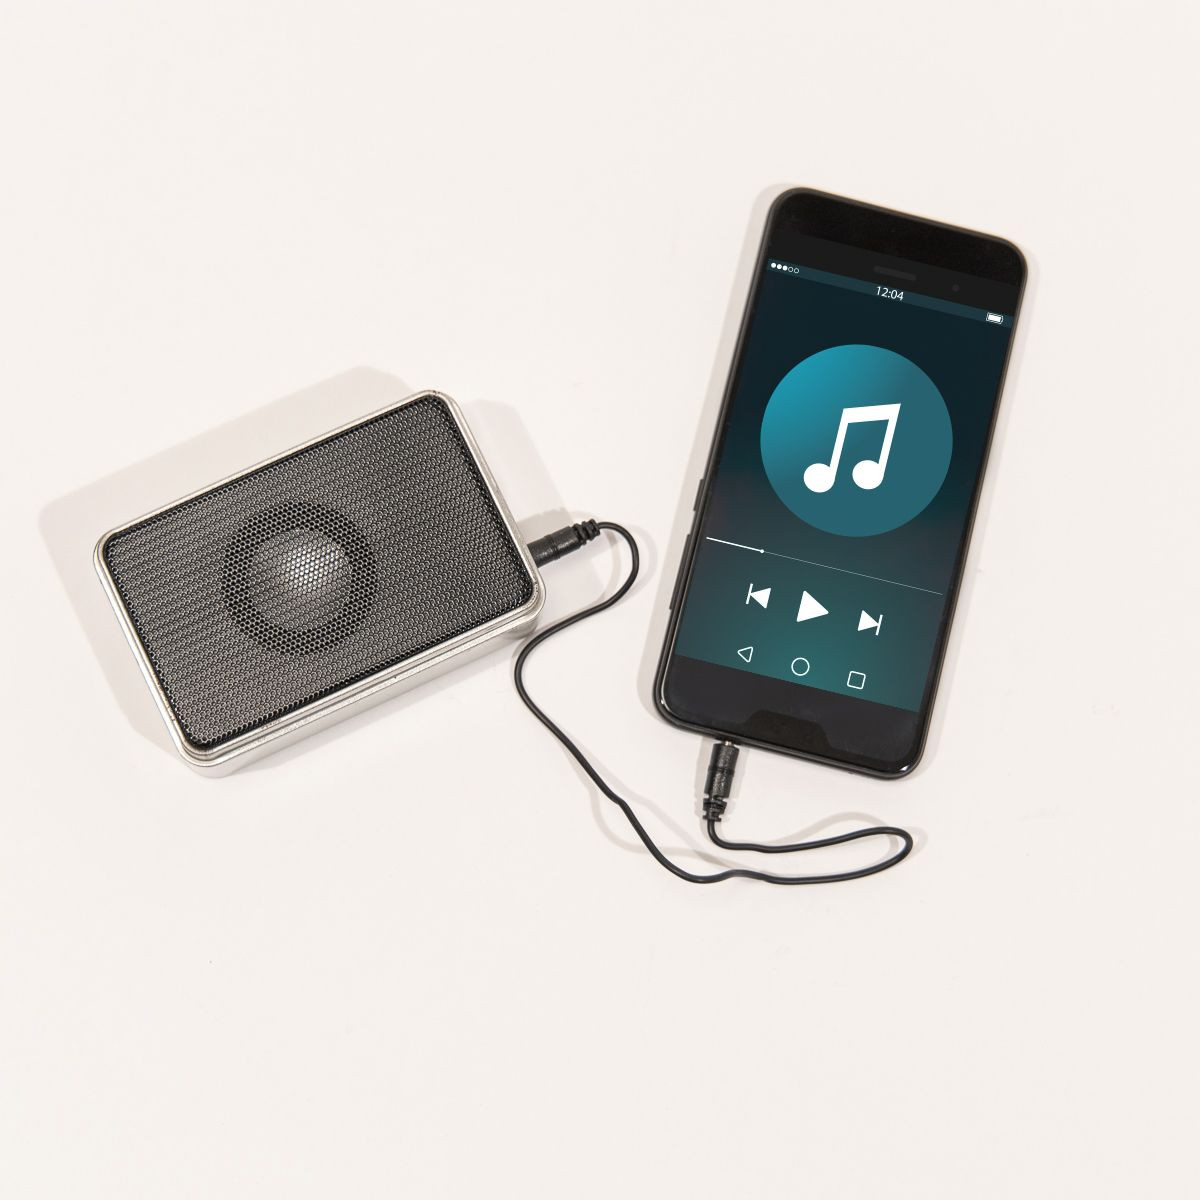 poctin_-_pocket_tin_speaker-12